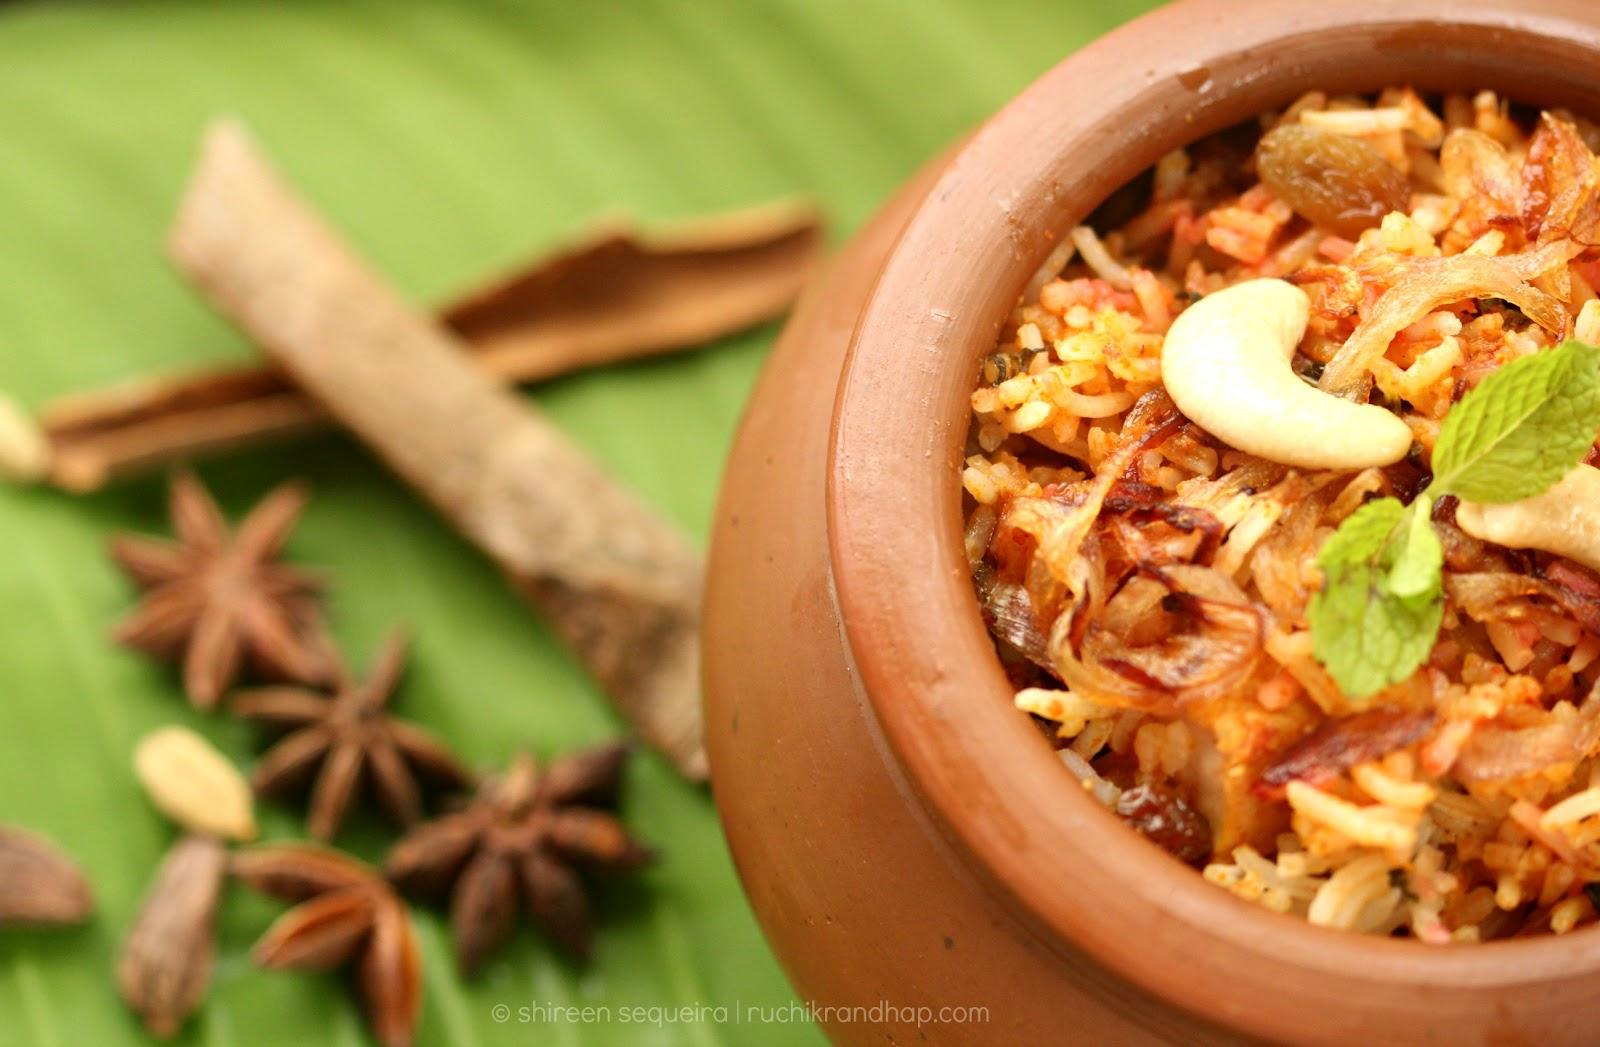 Ruchik Randhap (Delicious Cooking): Red Chicken Biryani